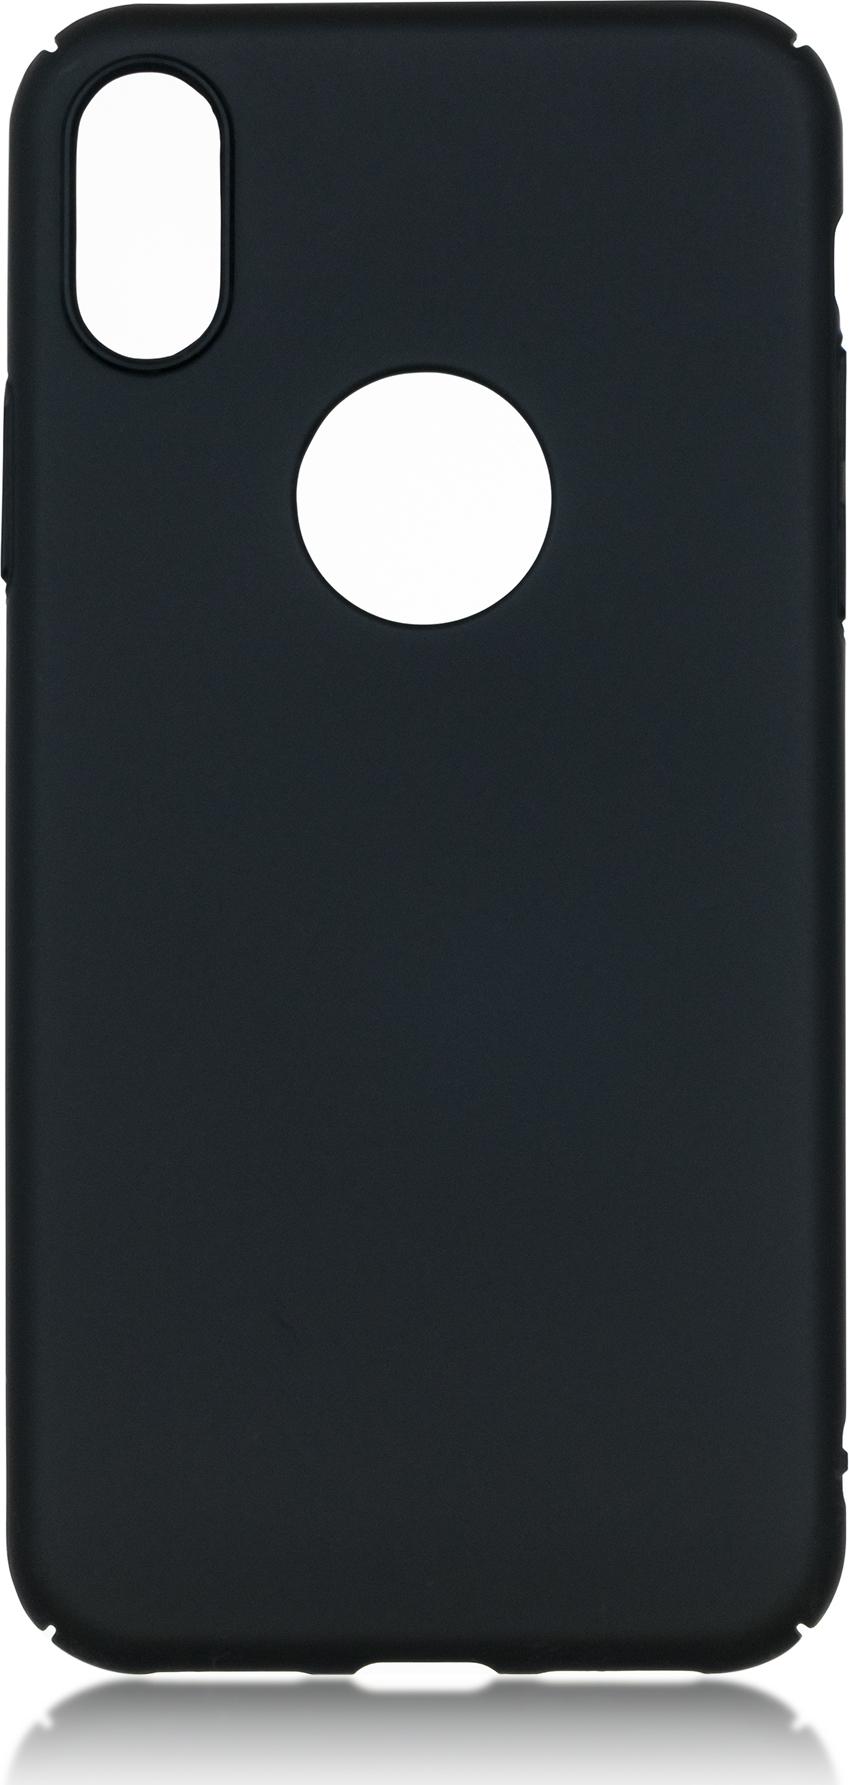 Чехол Brosco 4Side Soft-Touch для Apple iPhone X, черный